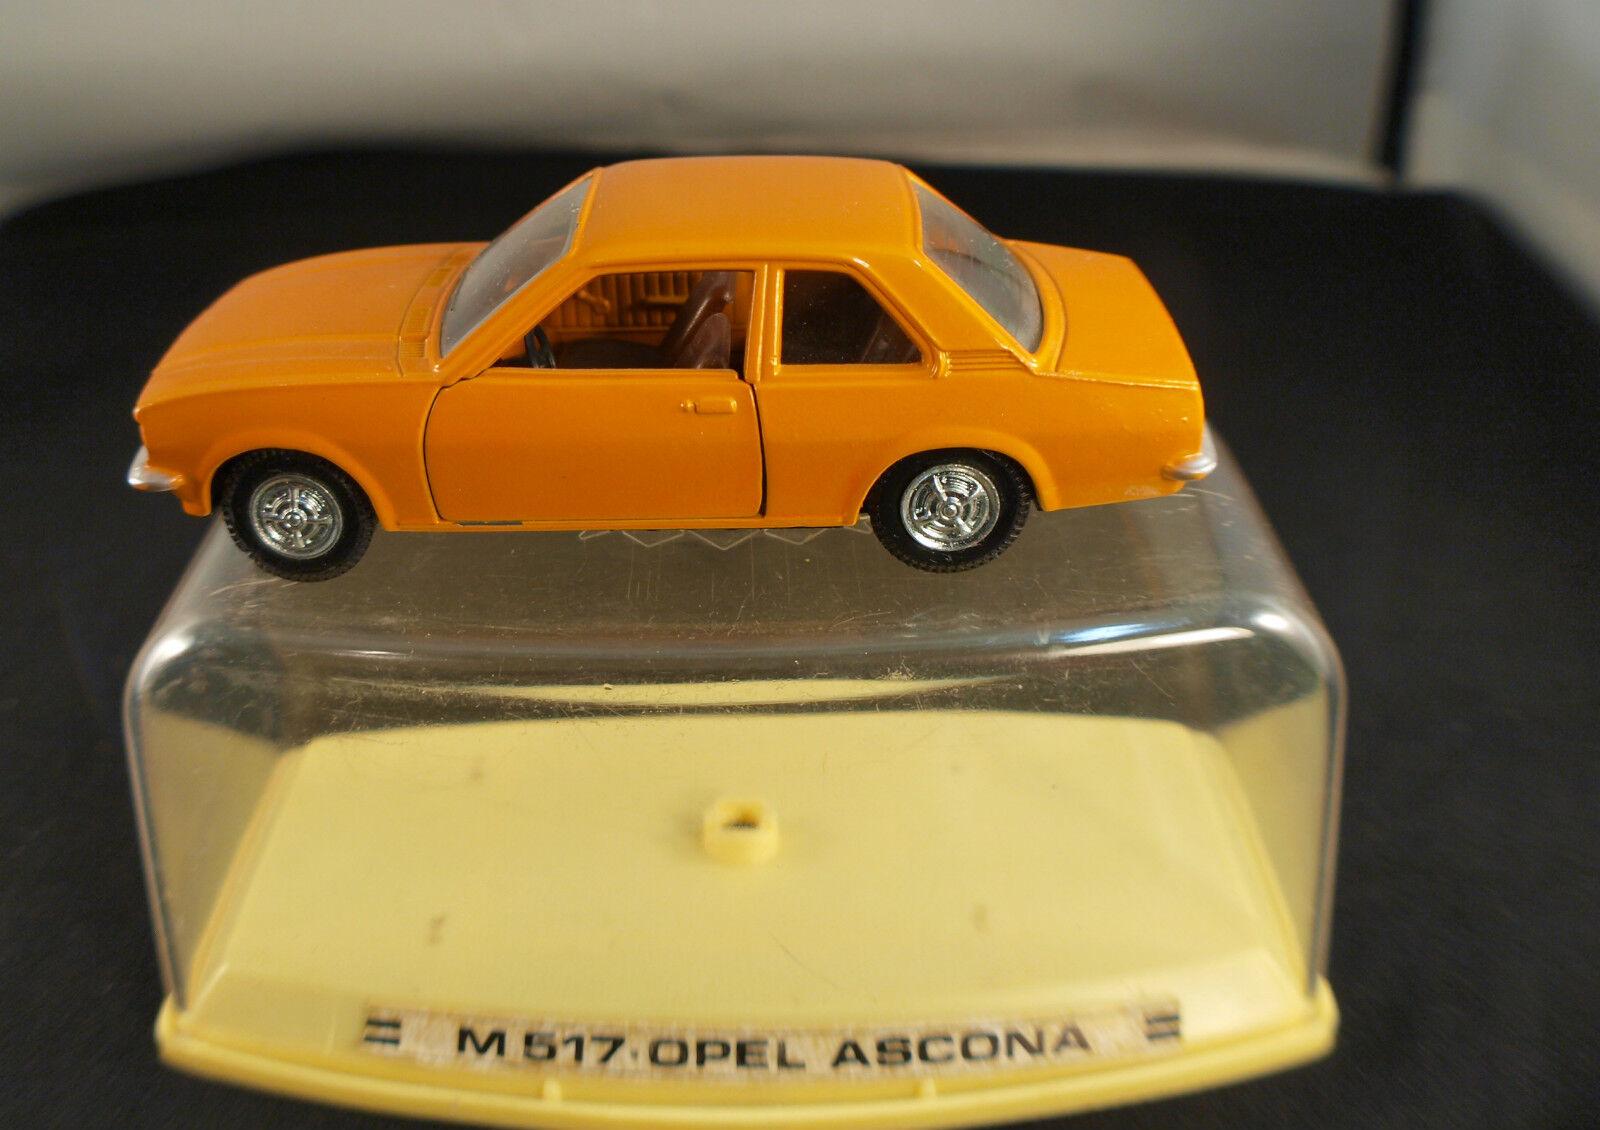 Auto doble m517 opel ascona new inbox in box 1 43 mib